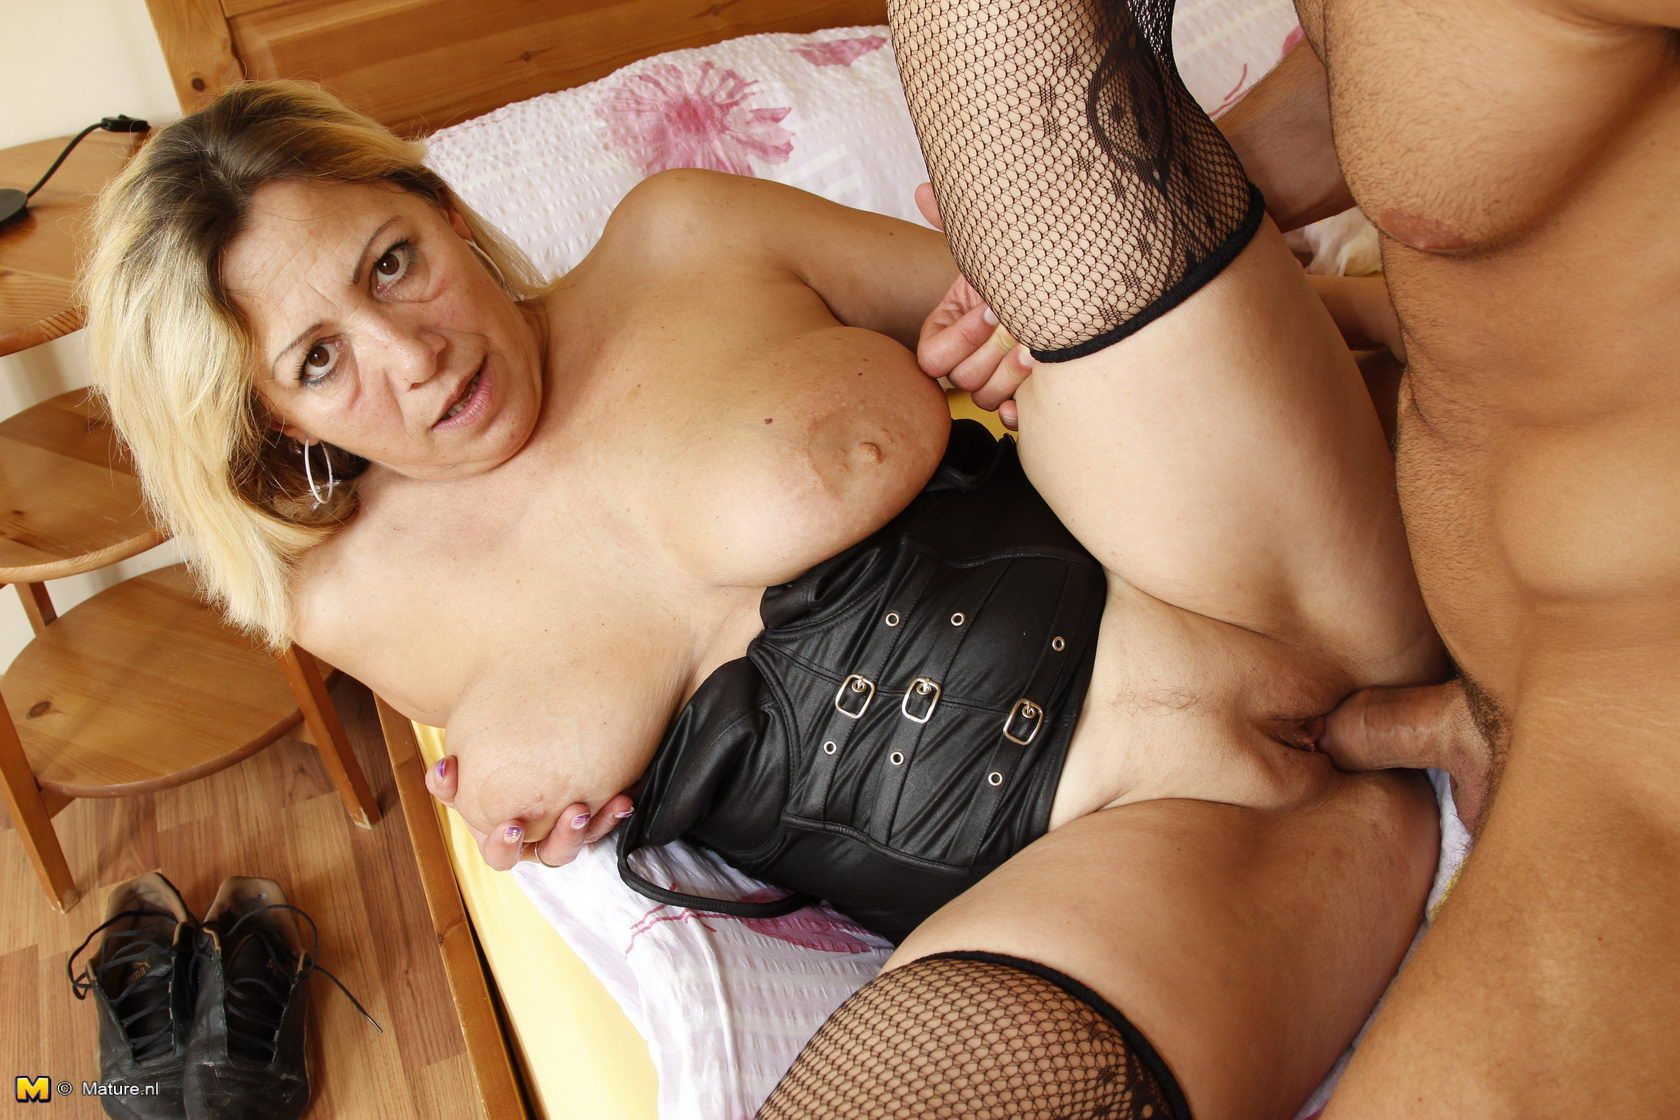 Models pussy penetration blonde